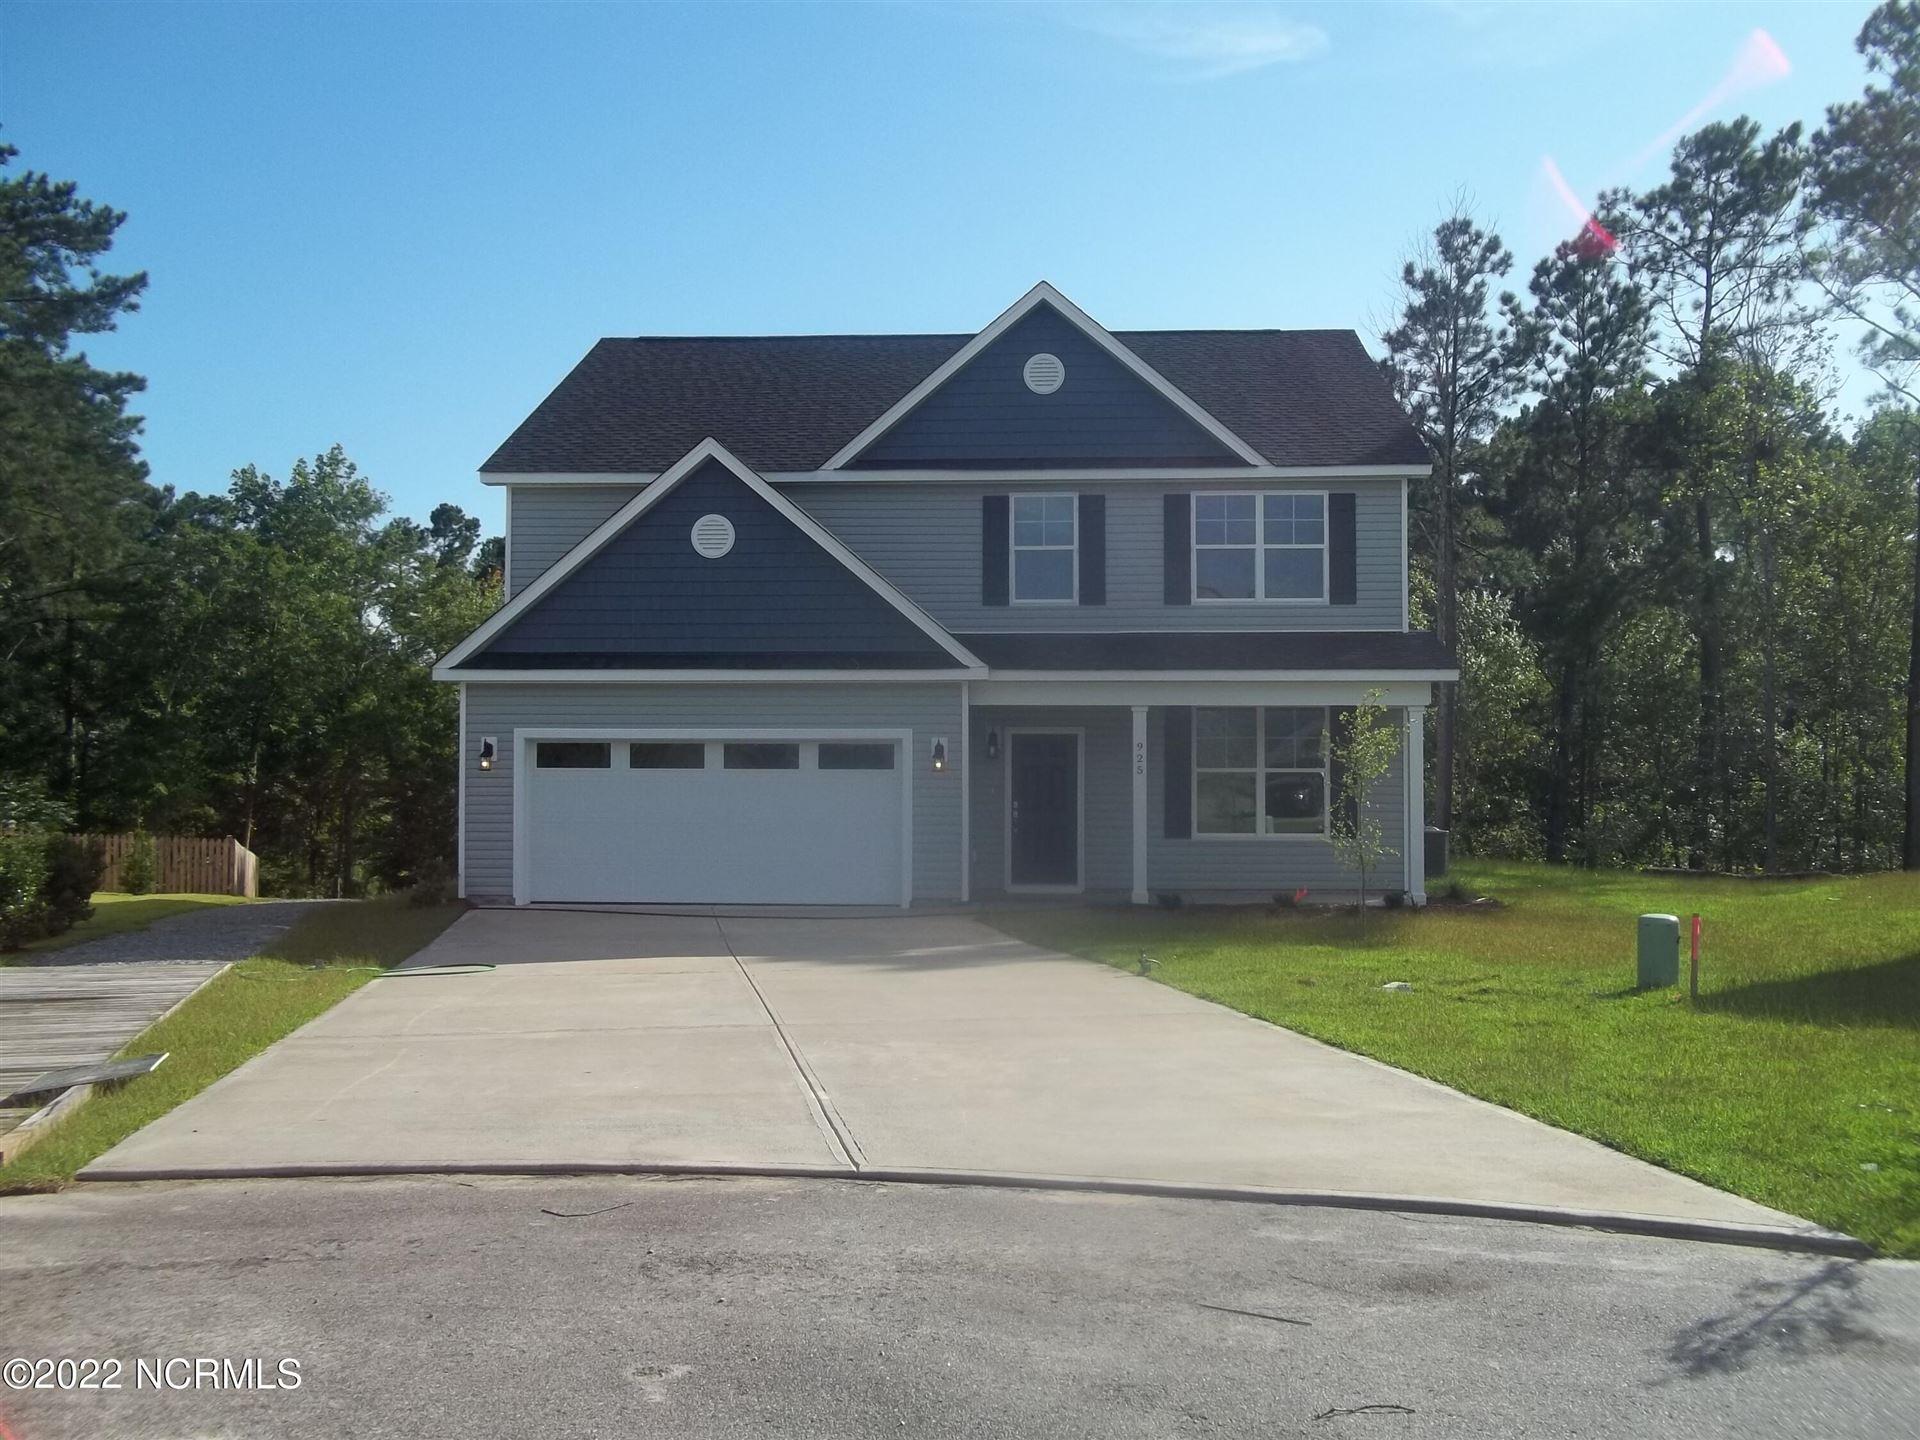 Photo of 925 W W Arboria Drive, Hampstead, NC 28443 (MLS # 100284596)